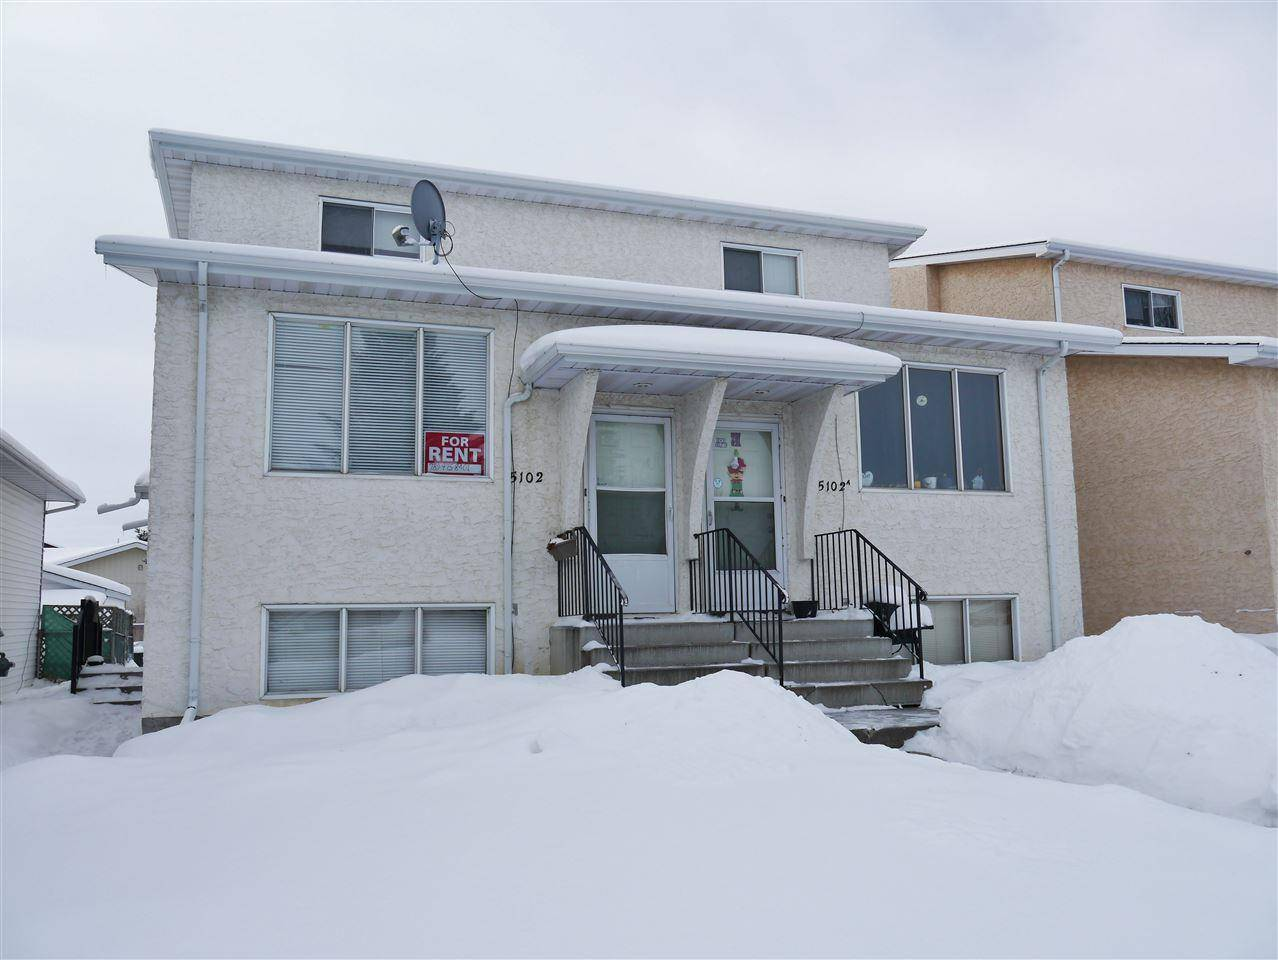 Townhouse for sale at 5102 57 Ave Stony Plain Alberta - MLS: E4194701